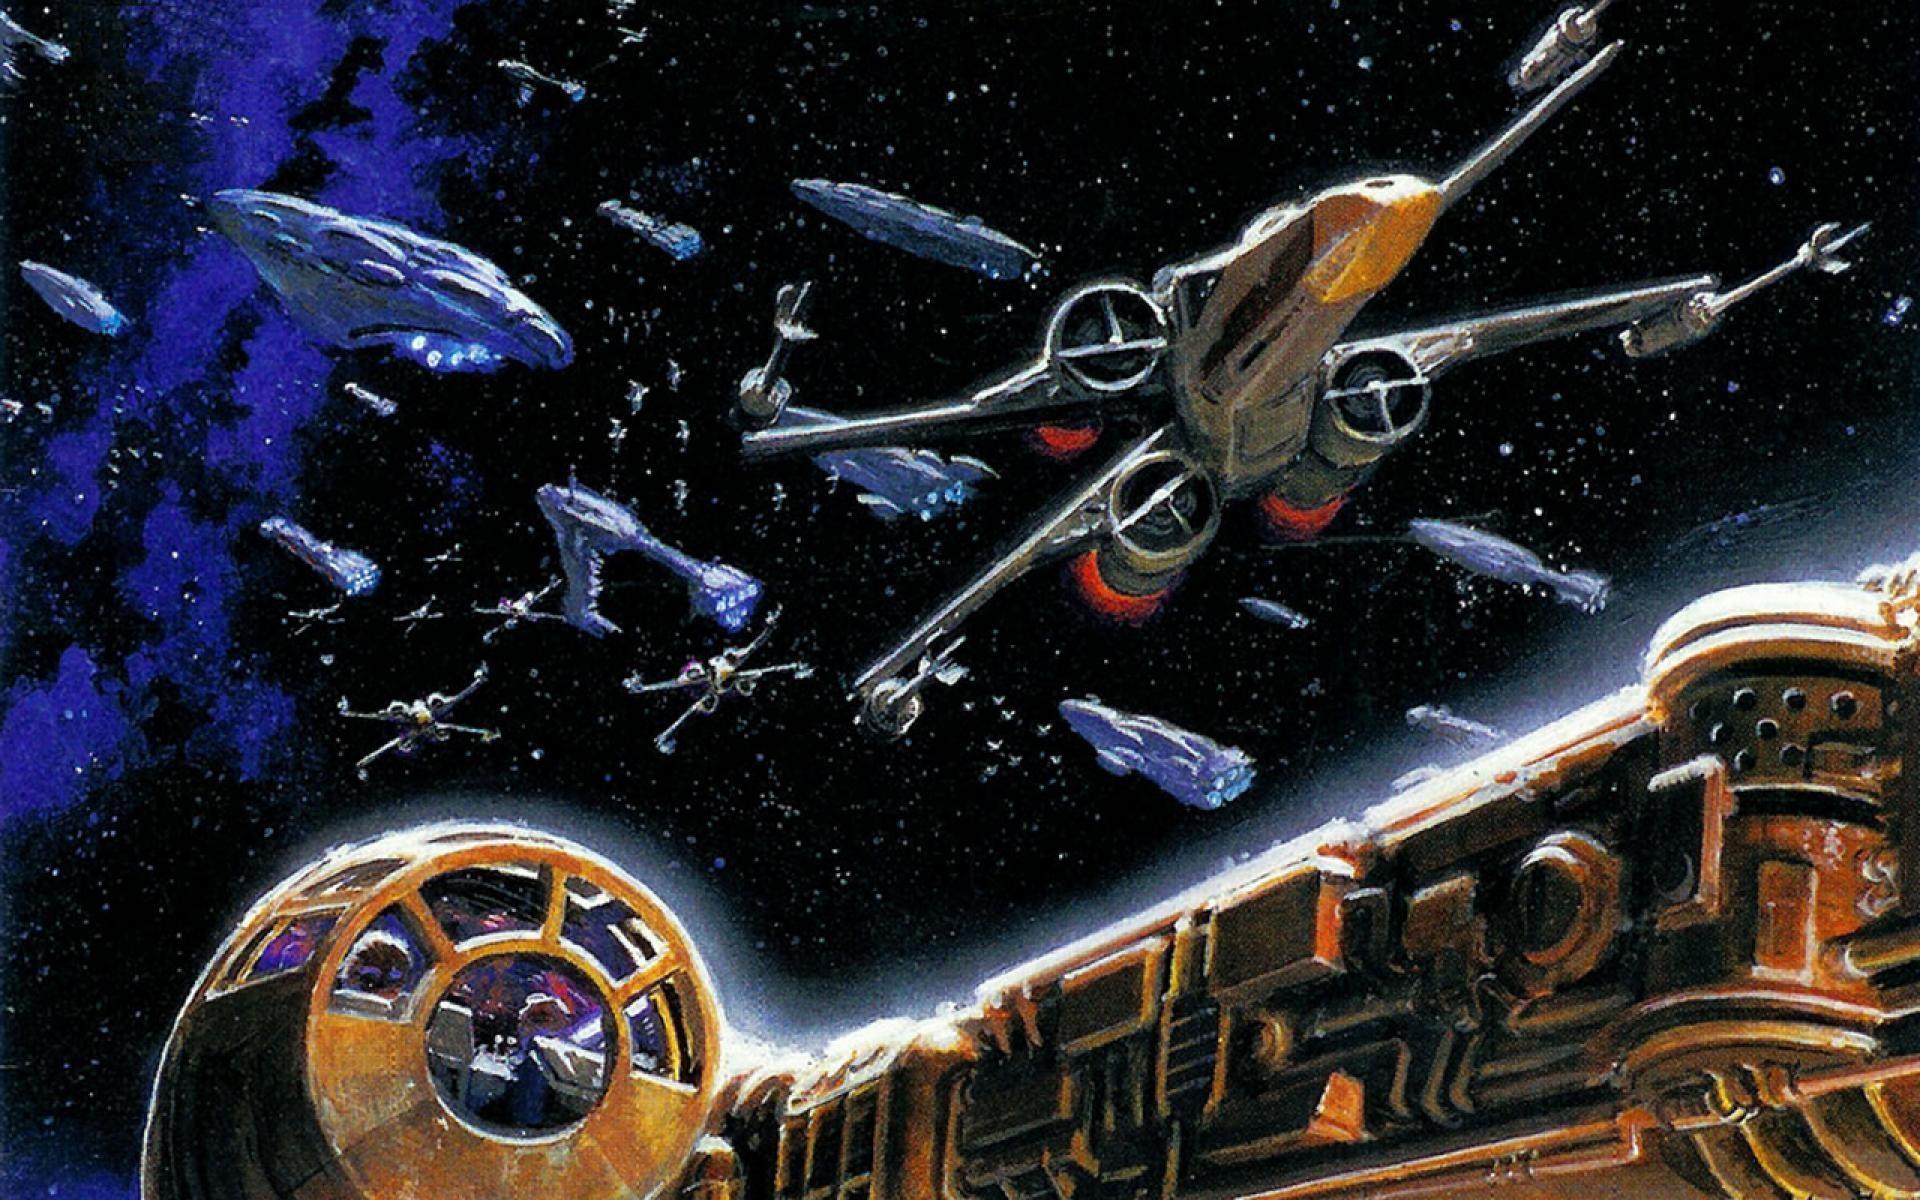 star-wars-millennium falcon-x-wing battle-hd-wallpaper